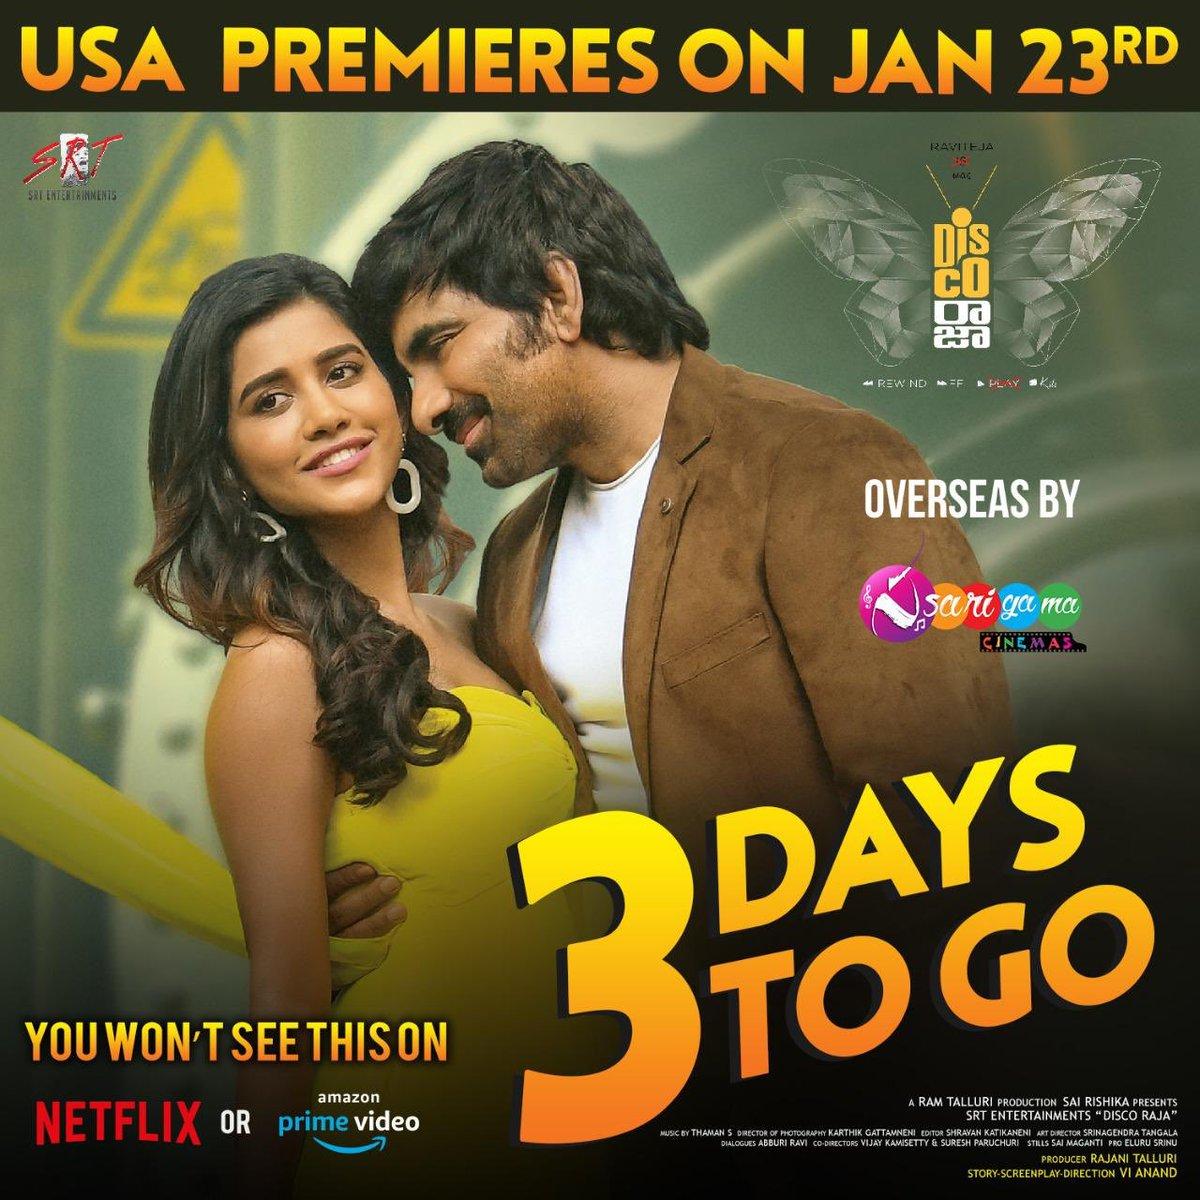 3 Days To Go For #DiscoRaja Premieres..  #USA  Premieres on Jan 23rd..  Biggest Release for @RaviTeja_offl   Overseas Release by @sarigamacinemas  @DiscoRajaFilm #raviteja @NabhaNatesh @starlingpayal #NabhaNatesh #PayalRajput pic.twitter.com/tzmodE78Pb